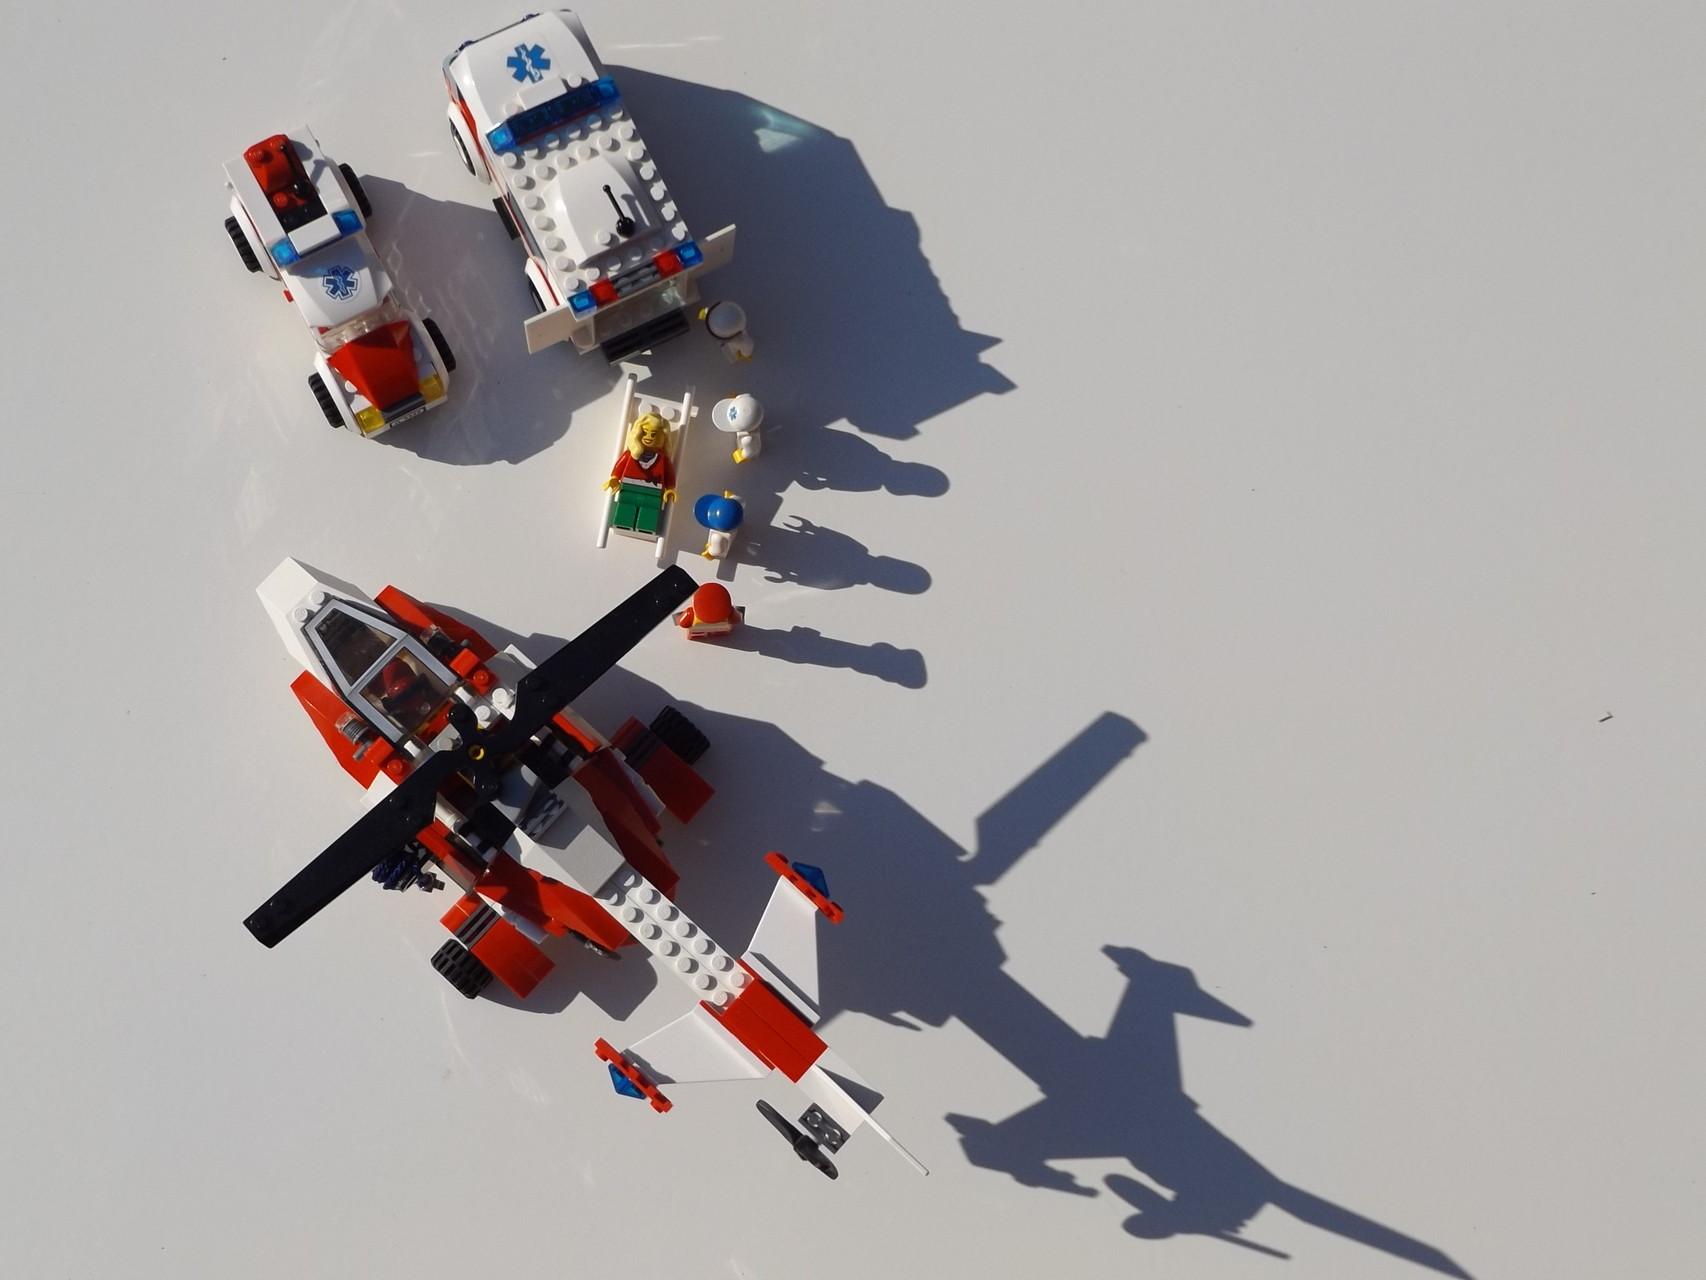 Rettungs-Helicopter 7903 Nachbau